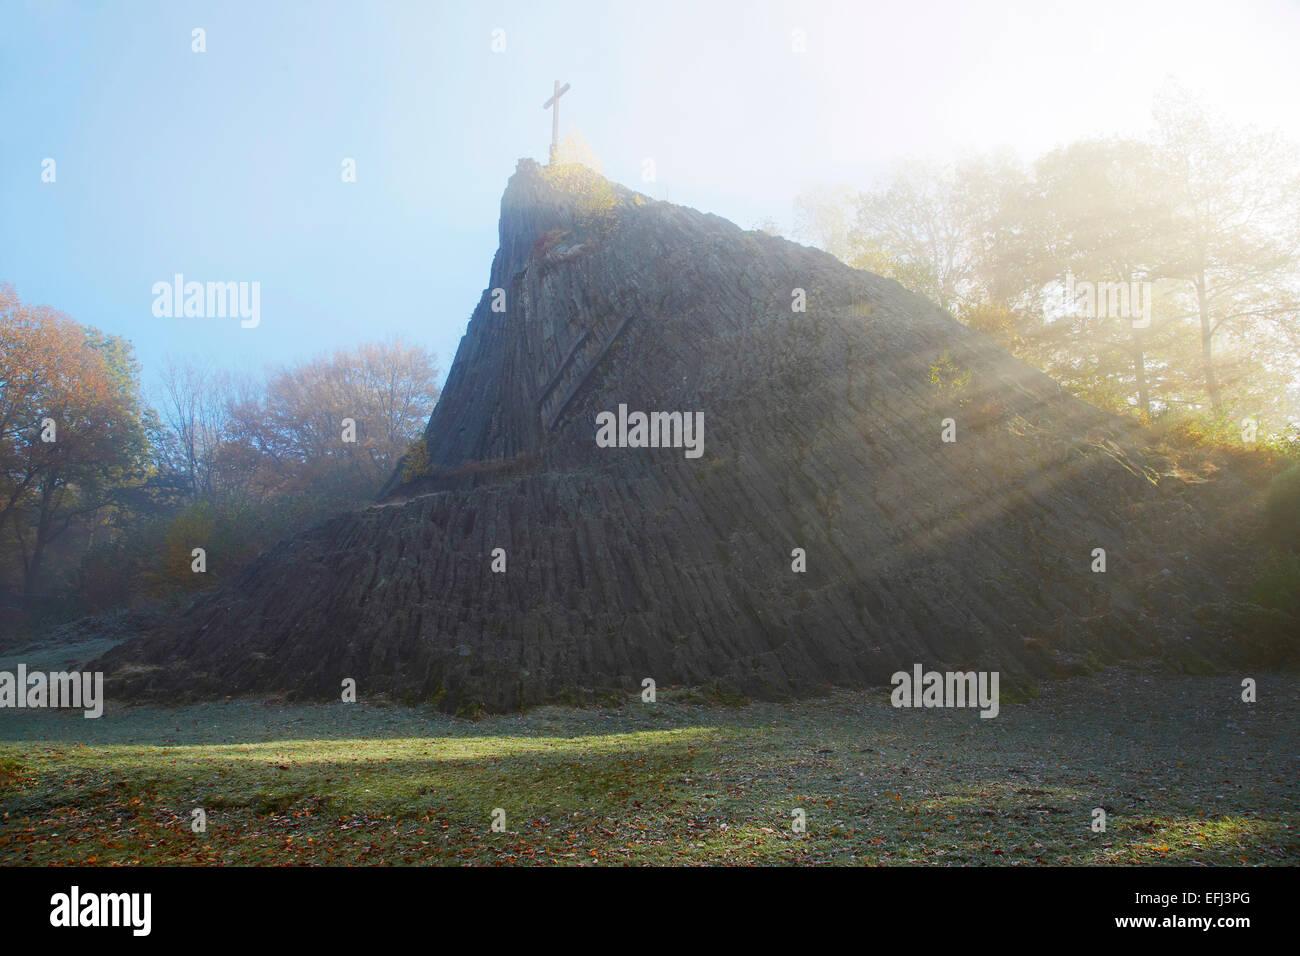 Druid rock, Druidenstein near Herkersdorf, Basalt formation, Westerwald, Rhineland-Palatinate, Germany, Europe - Stock Image